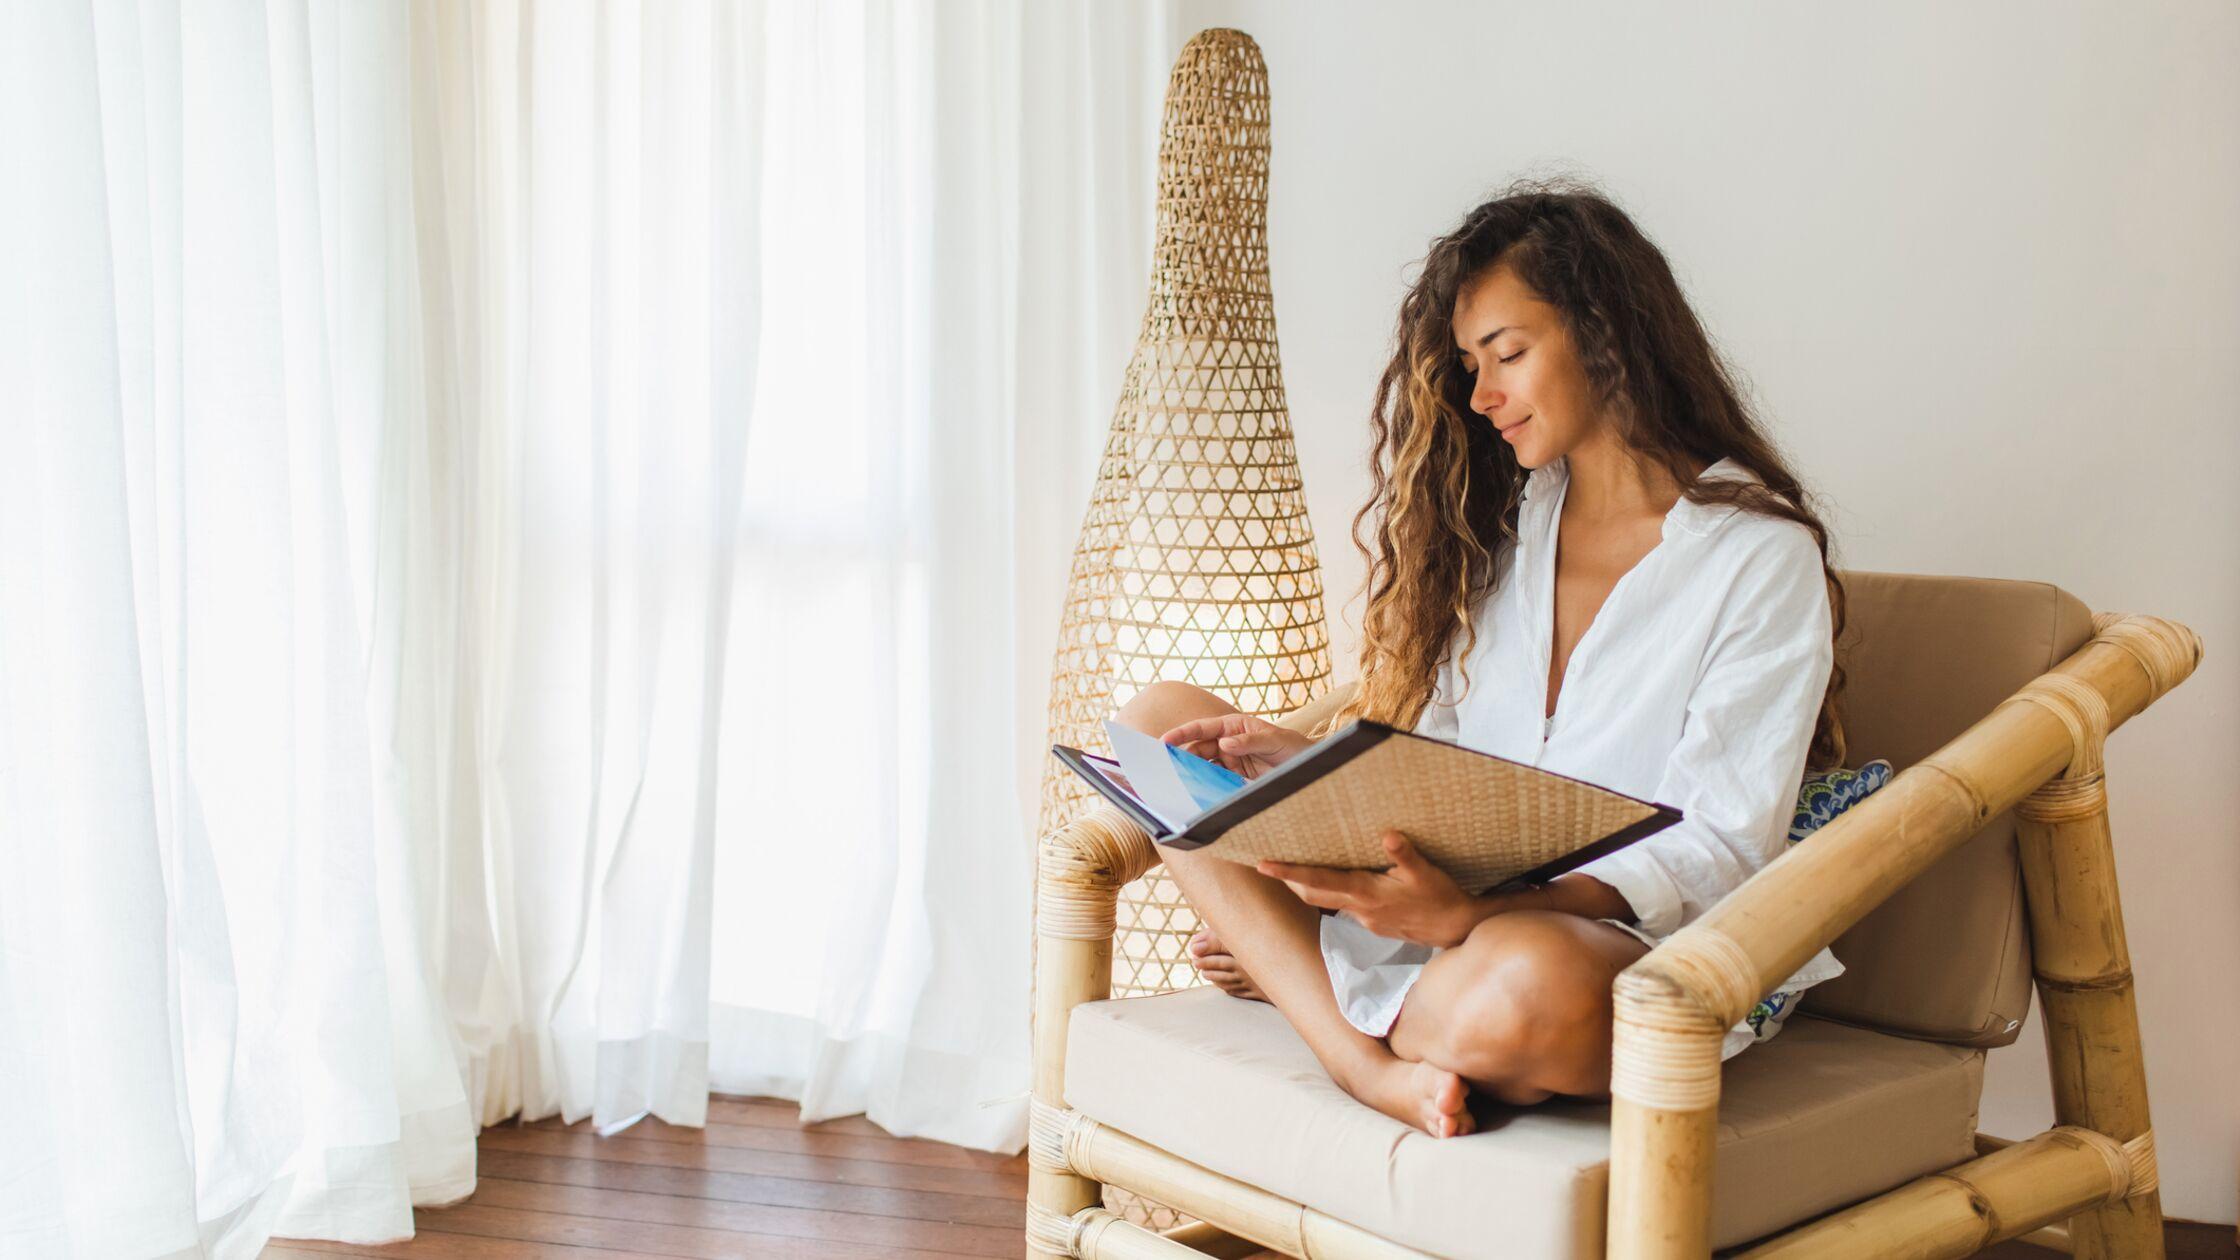 Frau sitzt auf Bambusstuhl